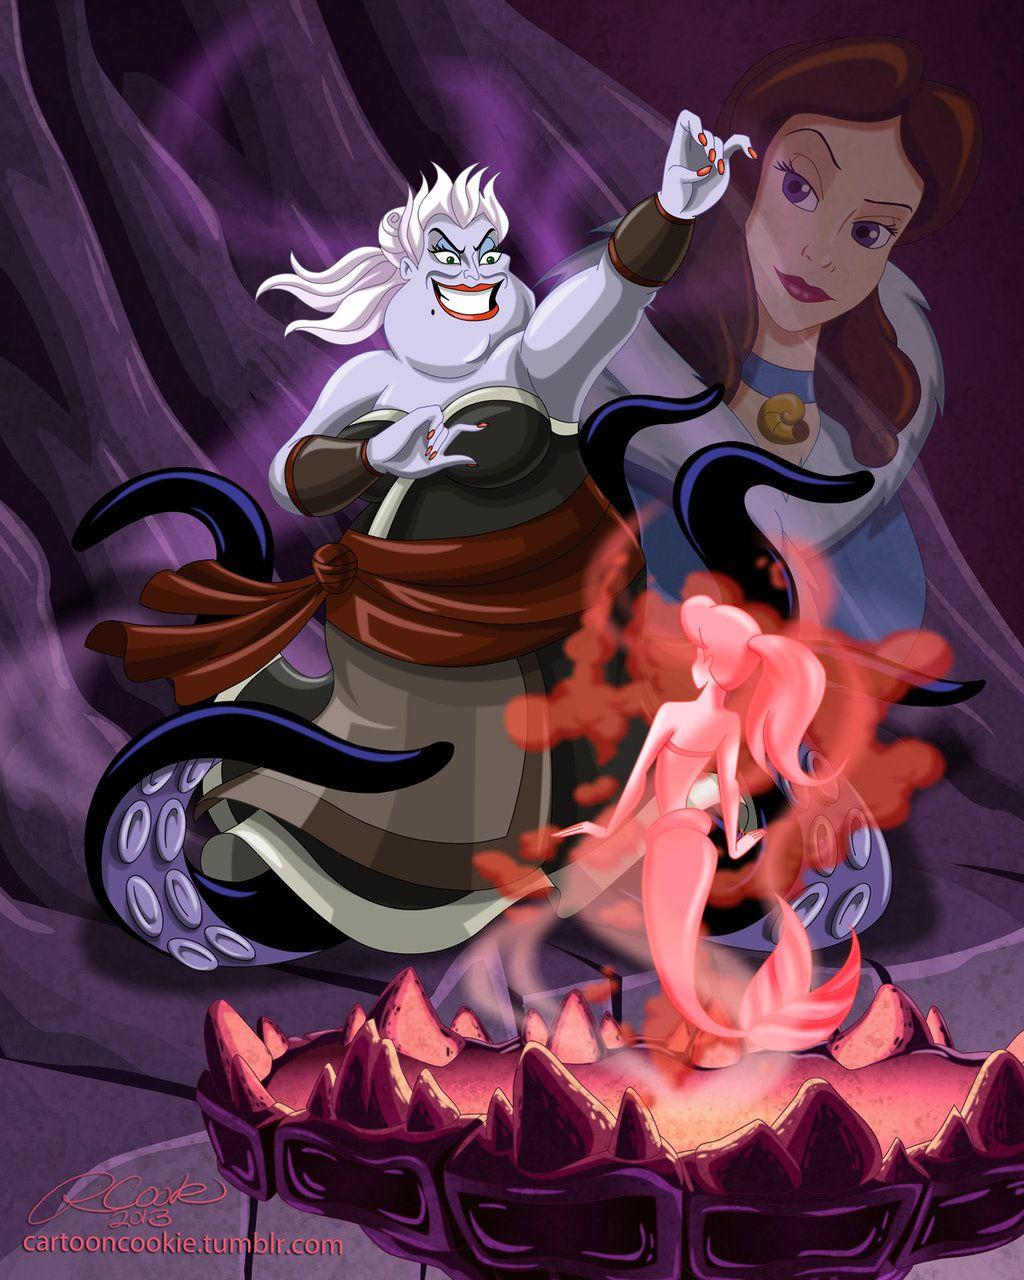 Disney/ Avatar Ursula, Blood Bending Sea Witch by racookie3.deviantart.com on @deviantART